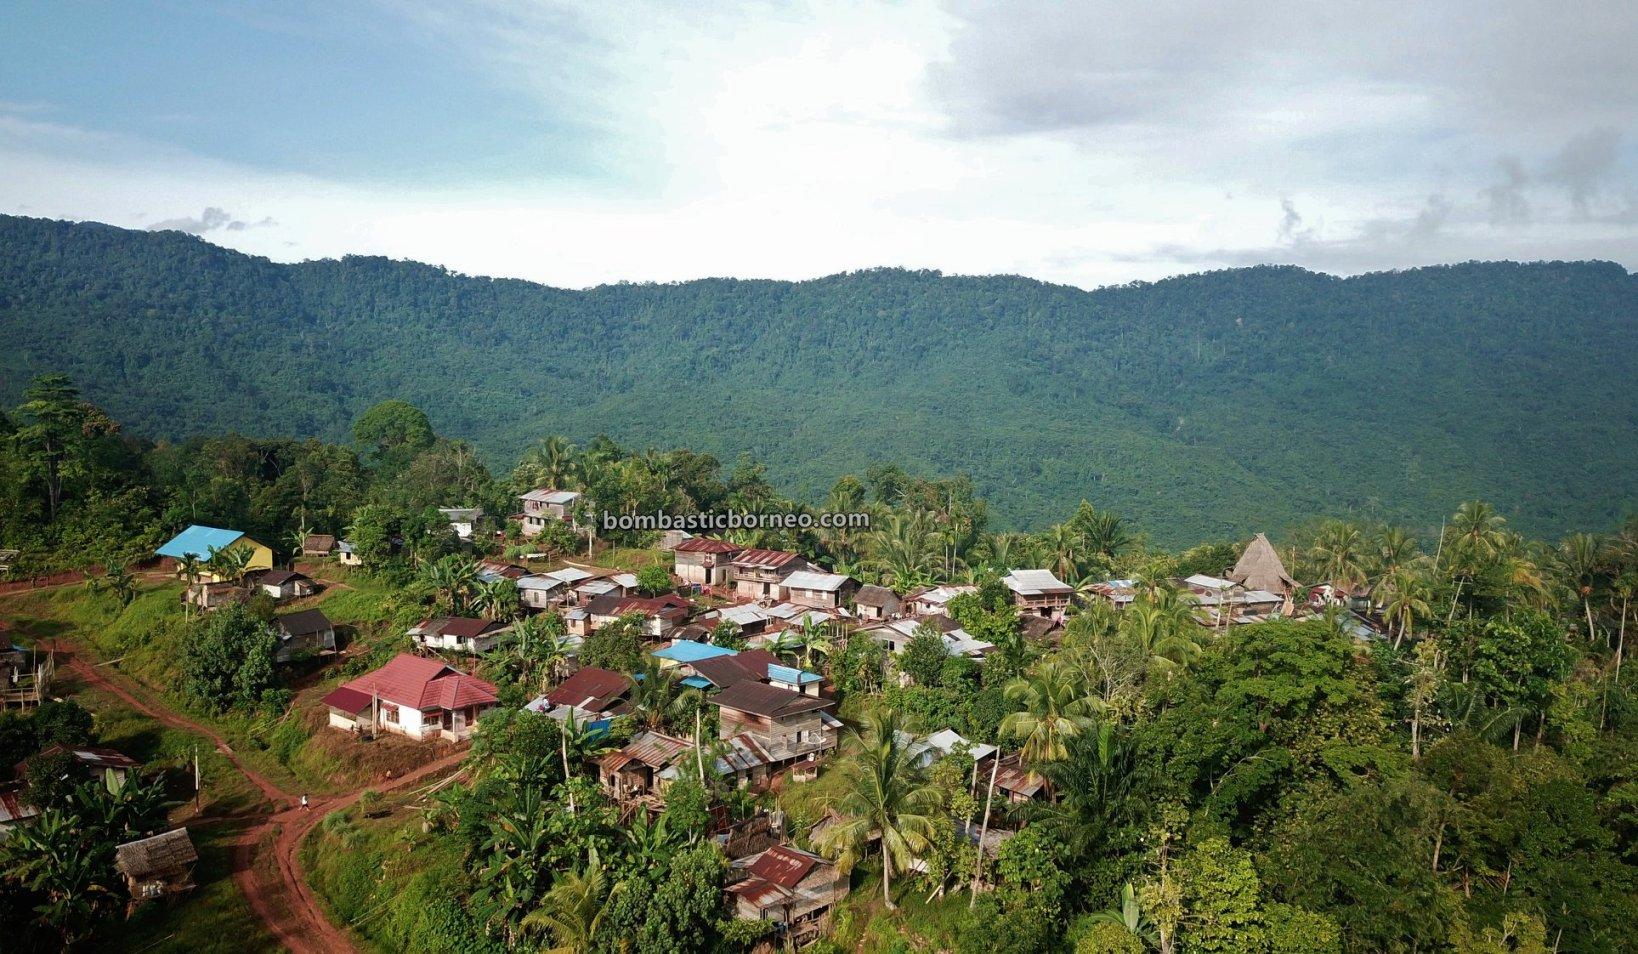 Dusun Tamong, adventure, destination, exploration, Kalimantan Barat, Siding, native, Dayak Bidayuh, tribe, Tourism, tourist attraction, travel guide, cross border, 婆罗洲比达友族,, 印尼西加里曼丹, 孟加映原住民高原,